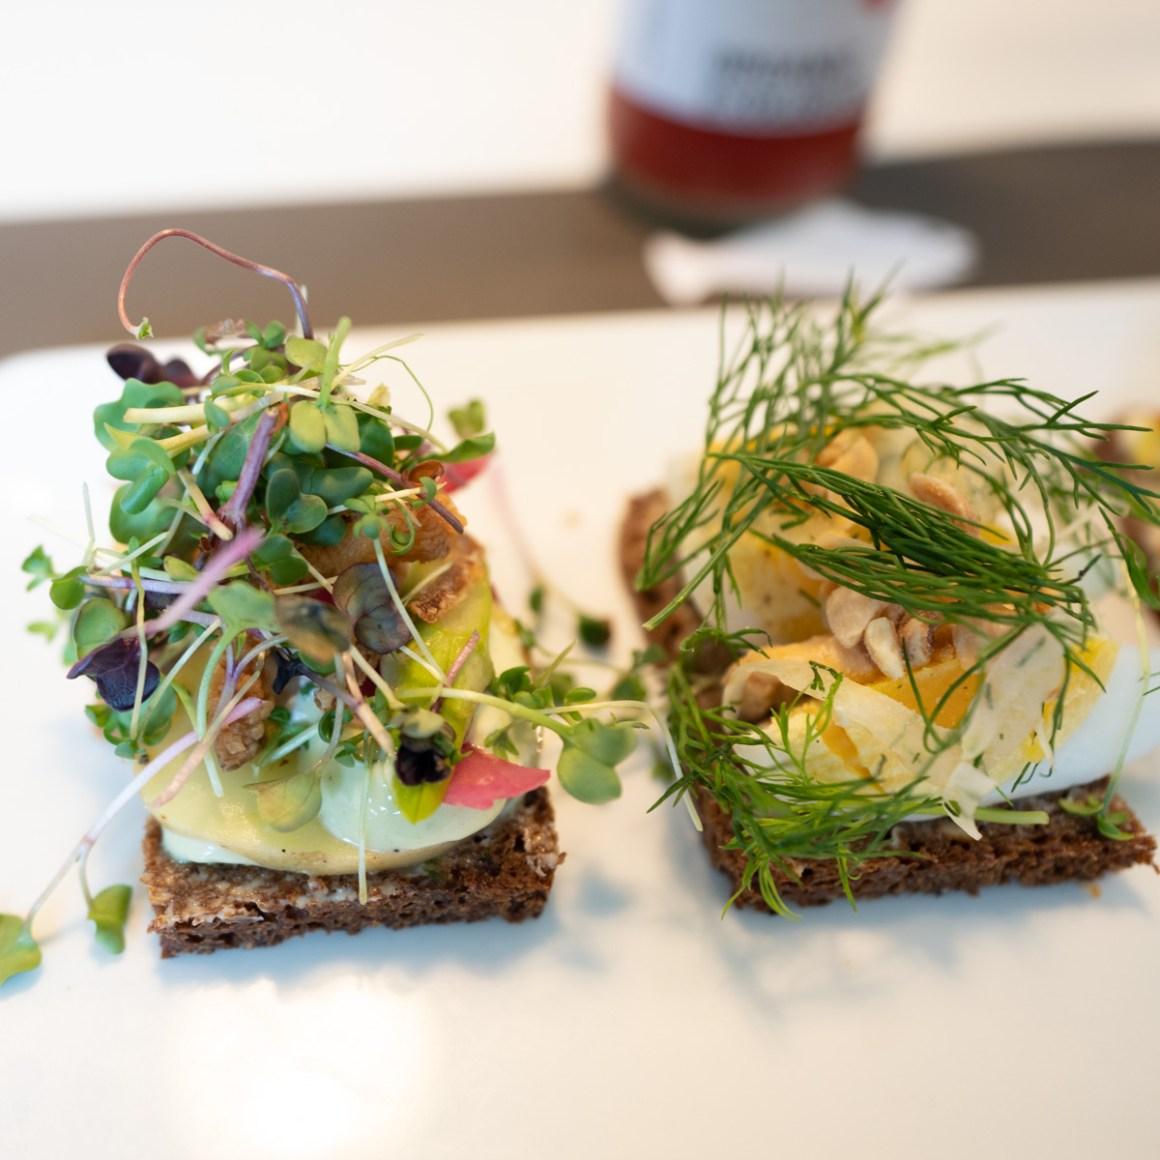 kopenhagen-food-guide-Amann-deli